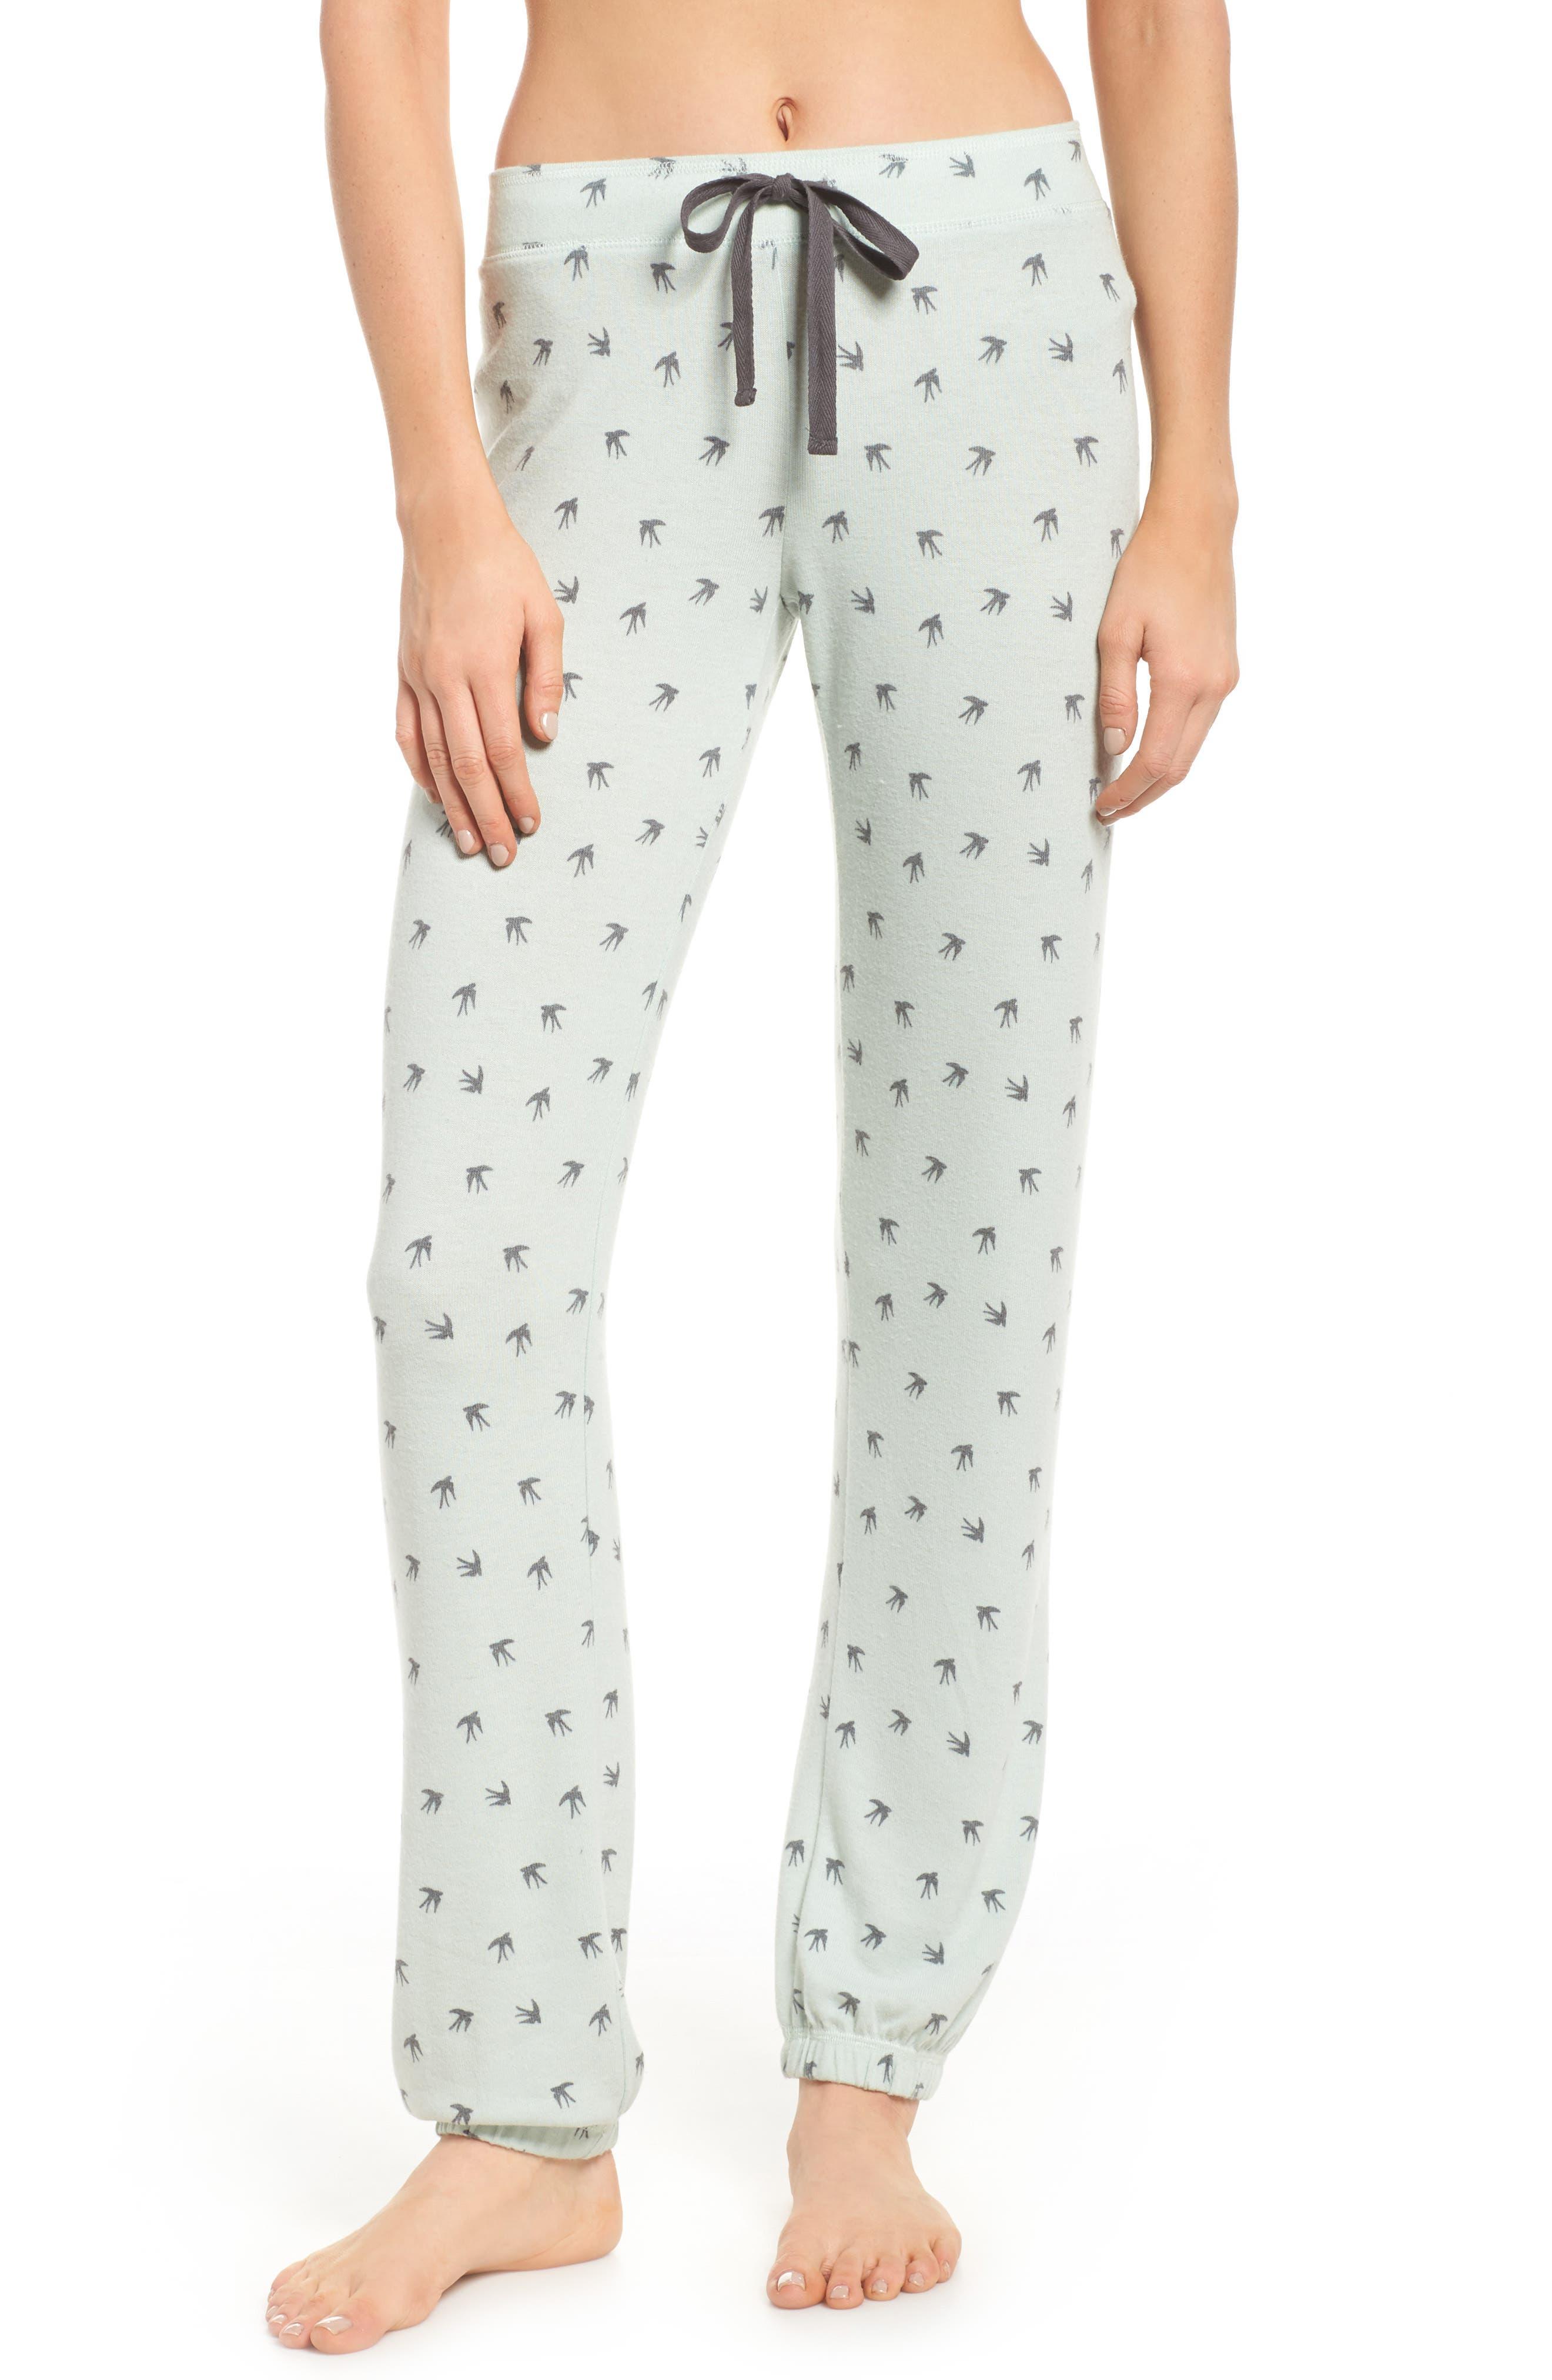 Peachy Pajama Pants,                         Main,                         color, Seafoam